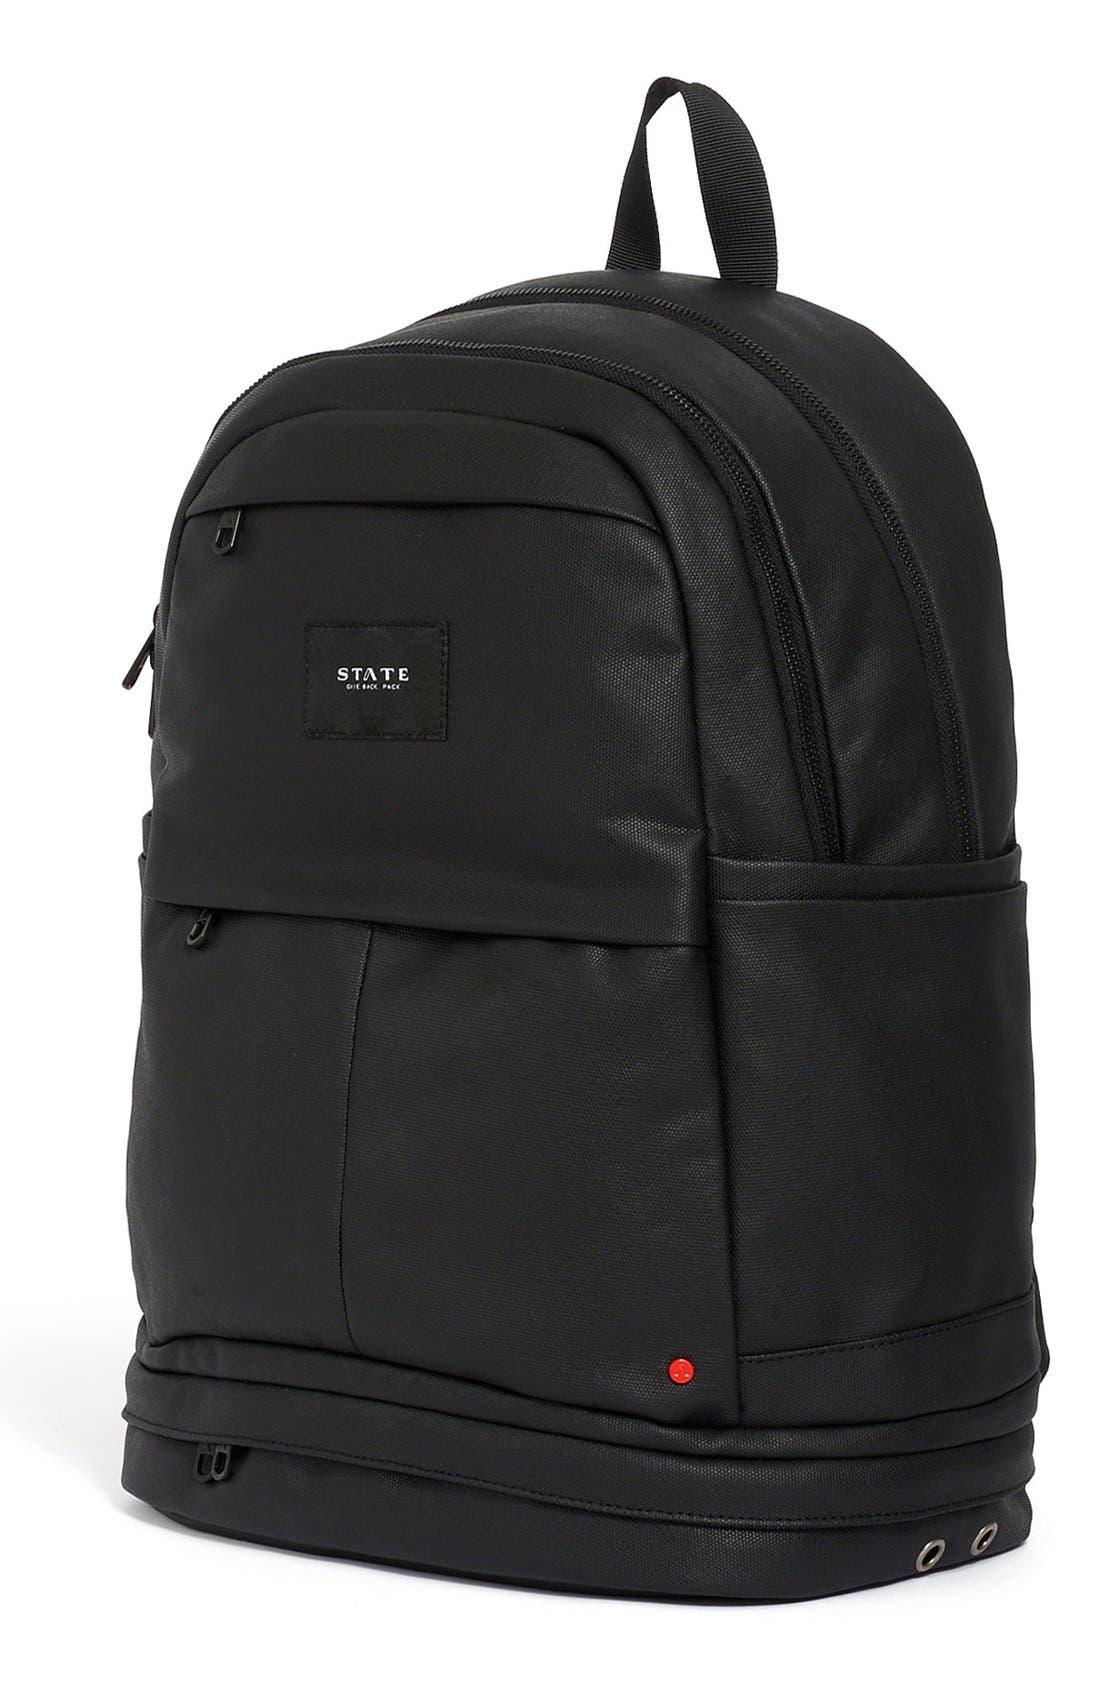 STATE BAGS,                             'Lenox' Backpack,                             Alternate thumbnail 2, color,                             001